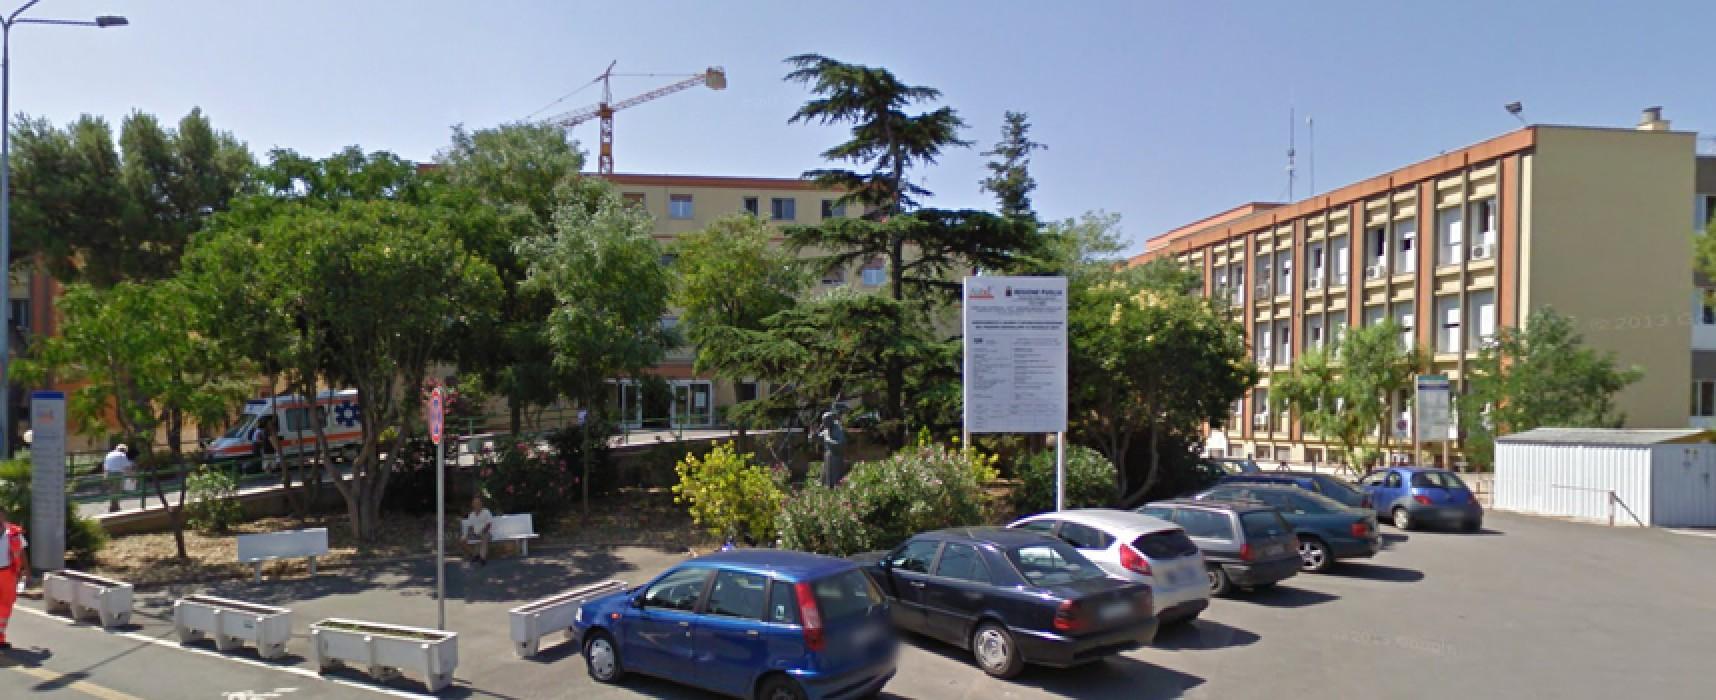 "Topo ospedale di Bisceglie, Asl Bat invia relazione in Procura: ""Era stato messo lì da qualcuno"""